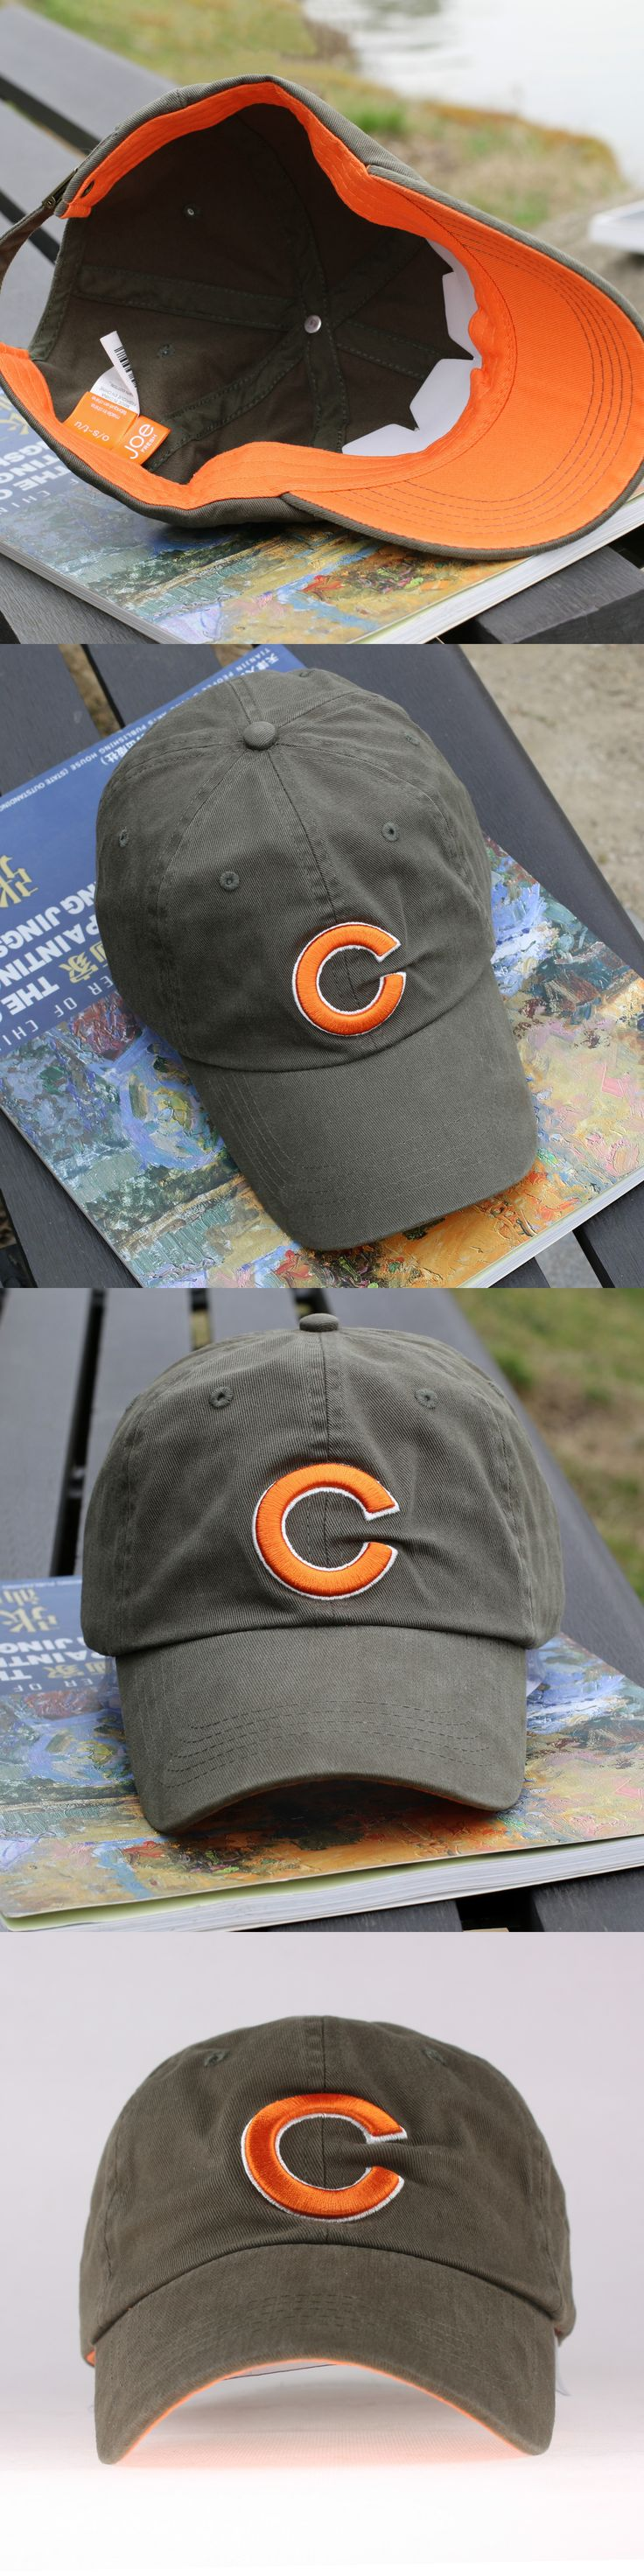 Male Korean Baseball Cap Hat spring summer outdoor sports cap cotton peaked cap sunscreen sun hat